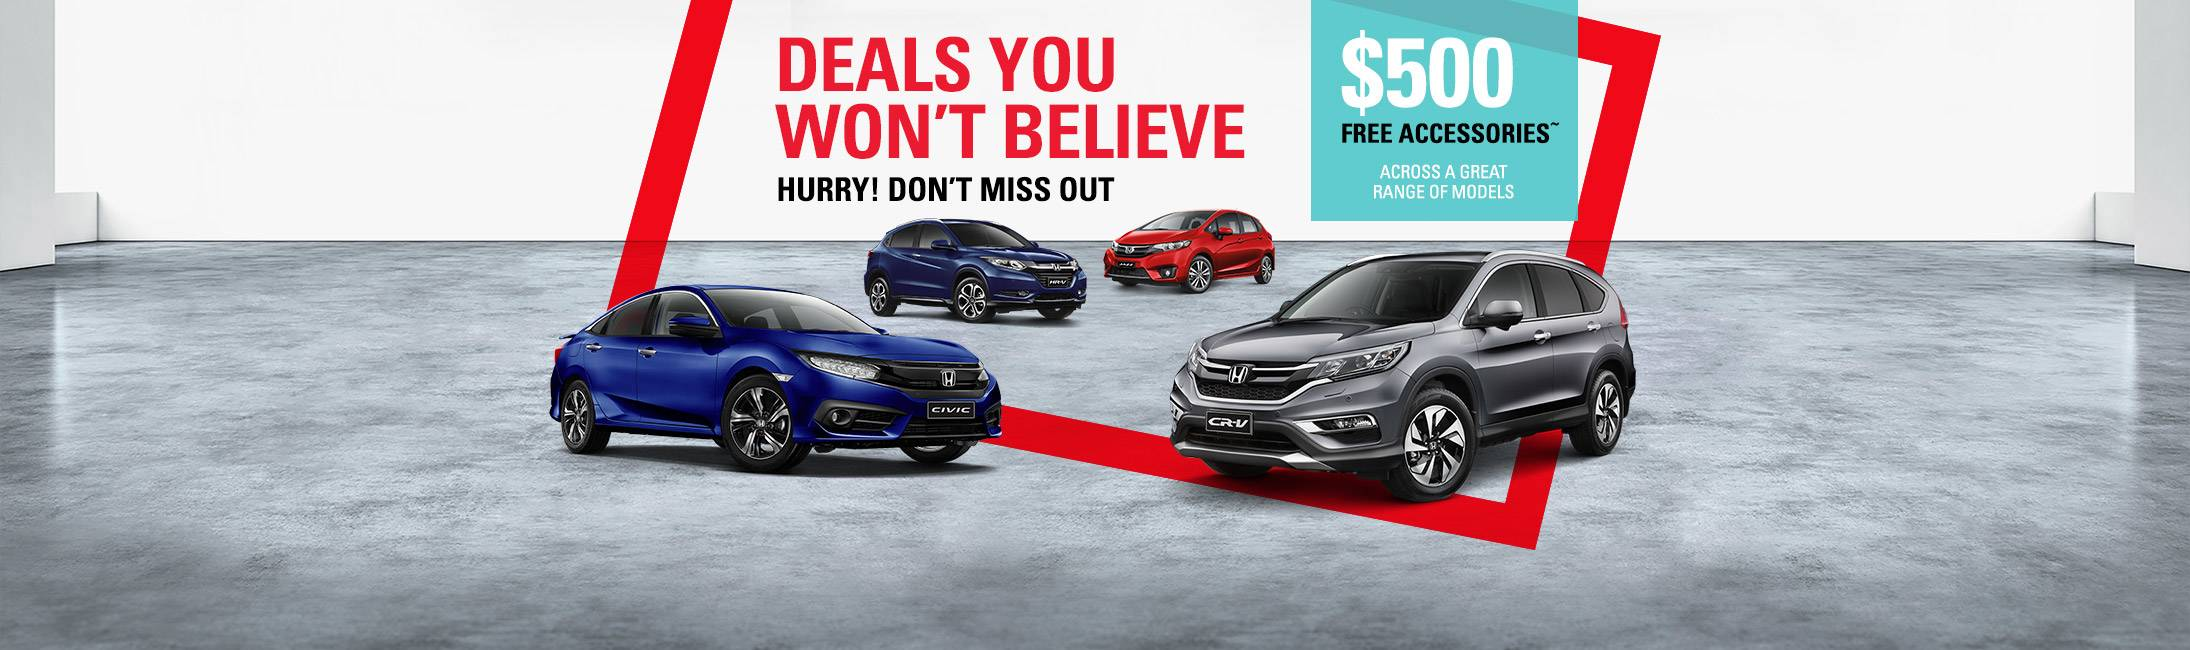 Honda Deals You Wont Believe